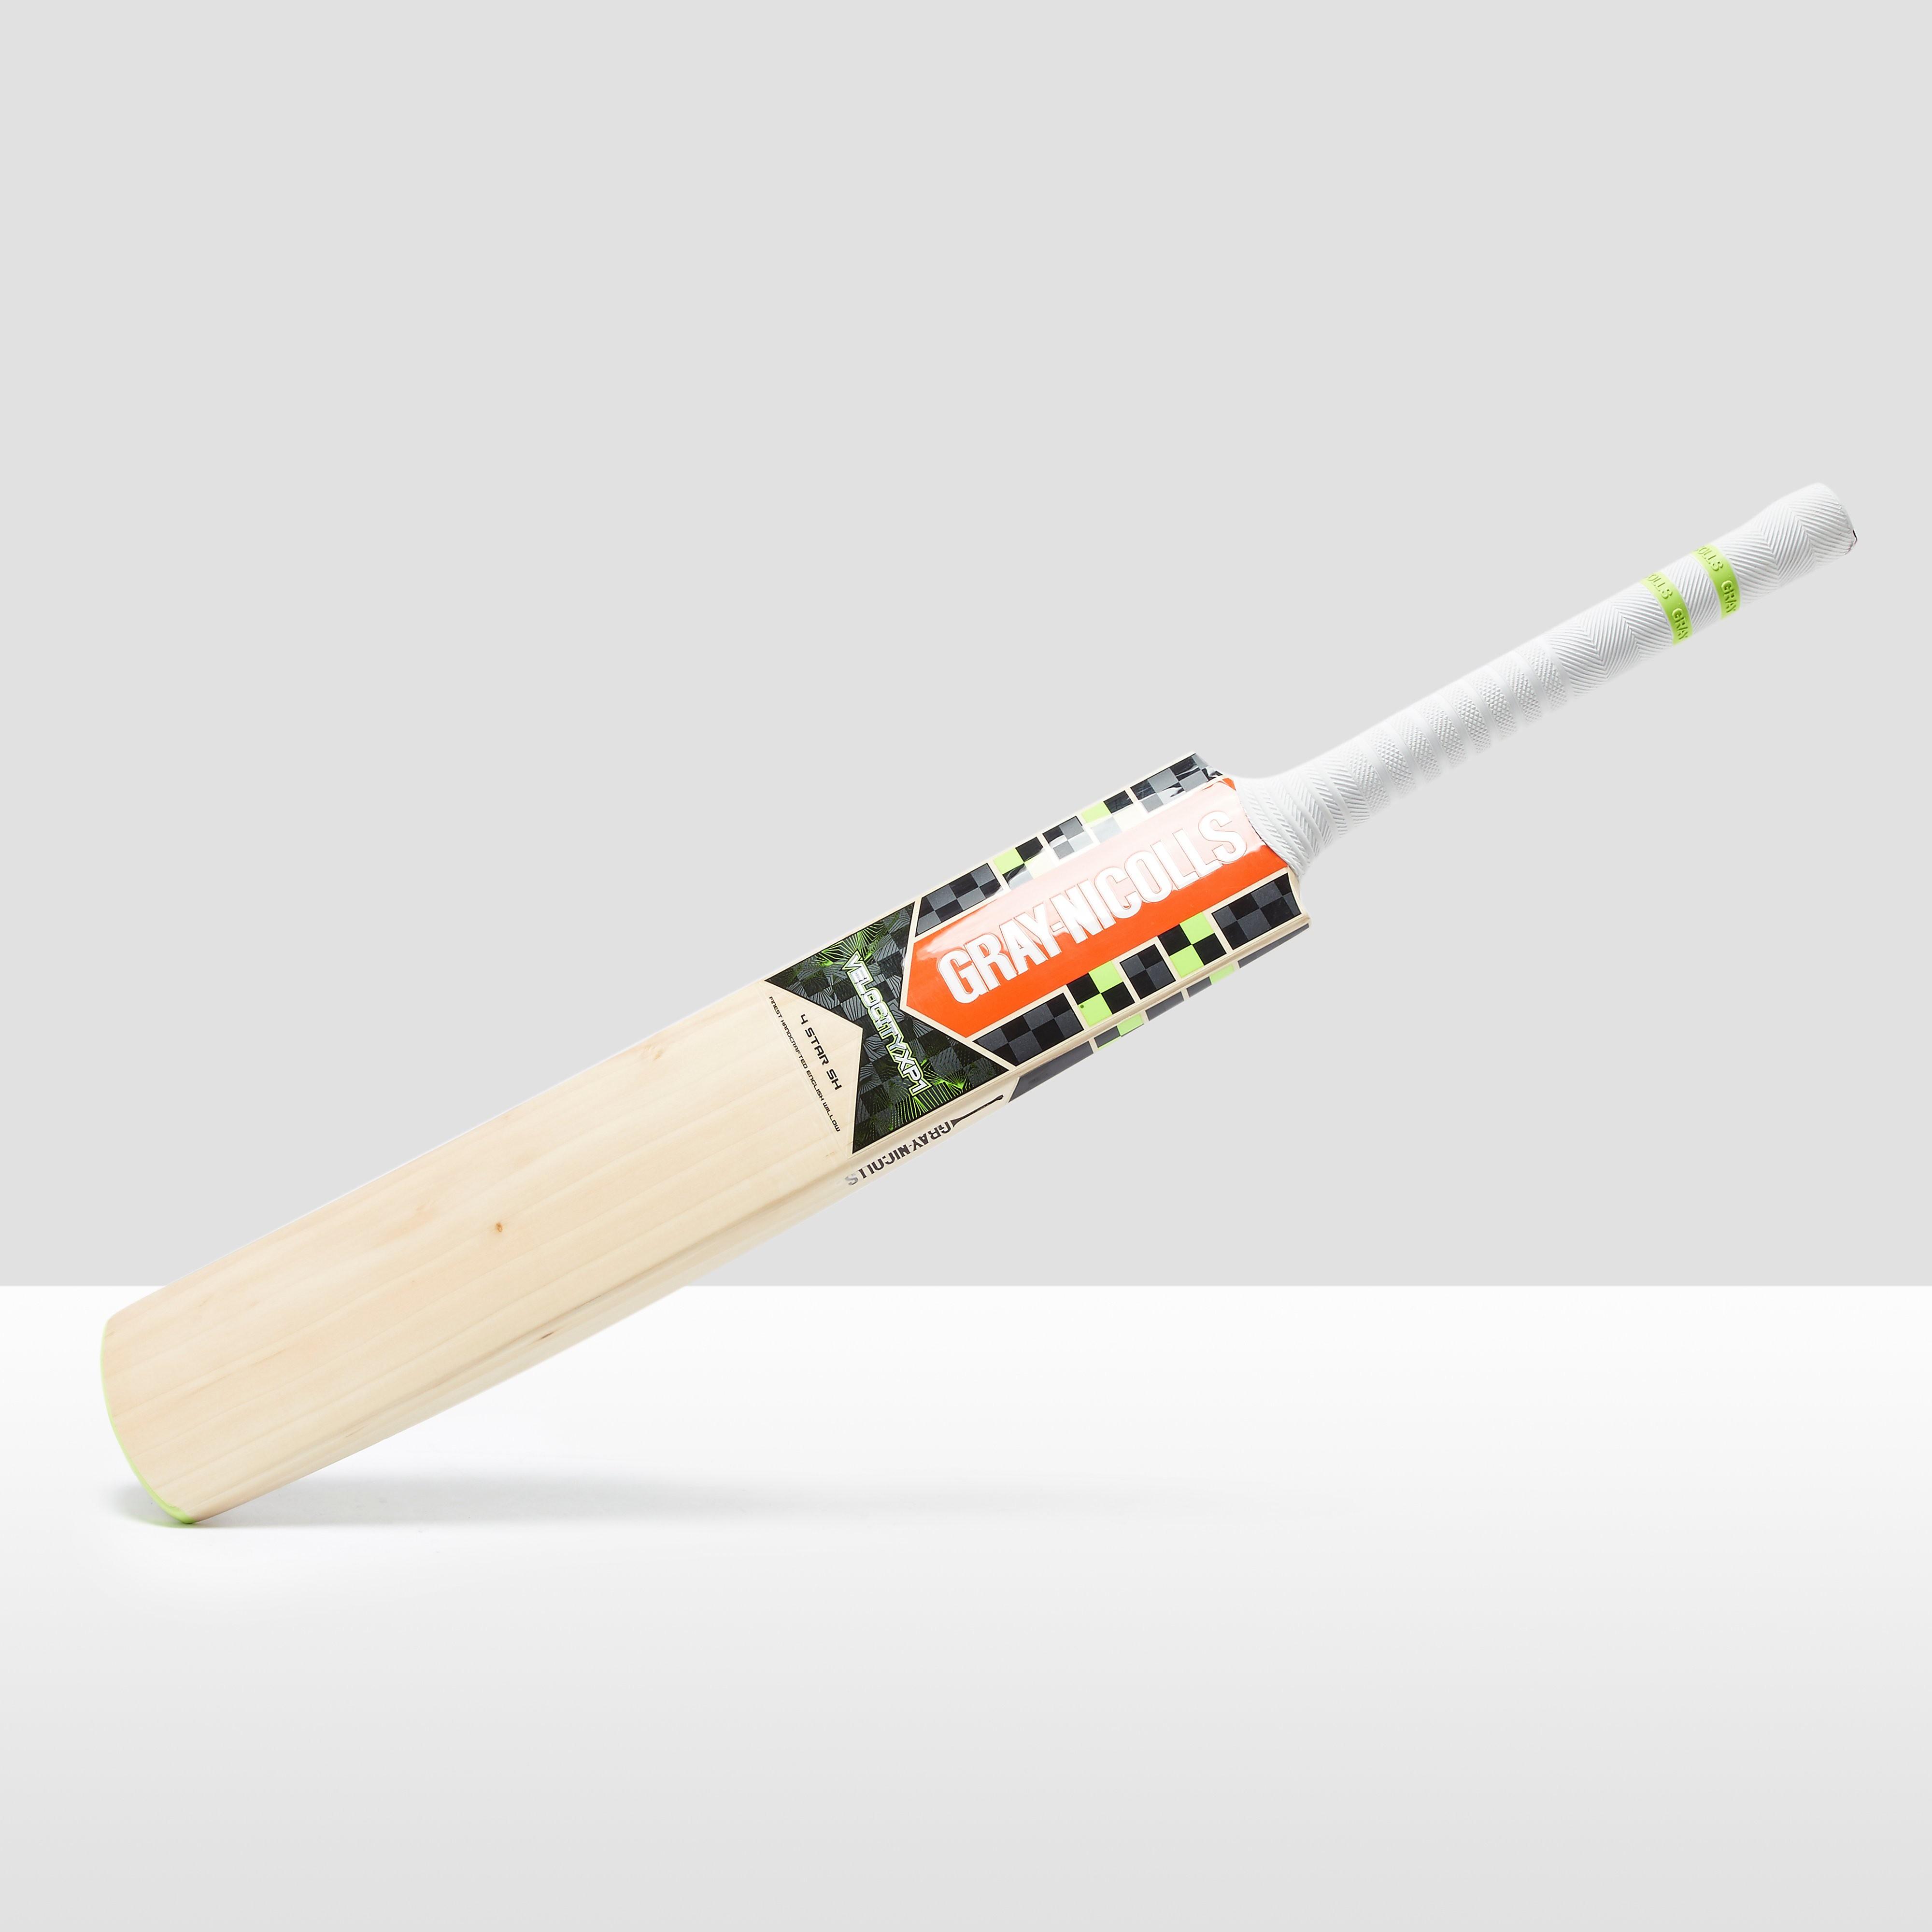 Gray Nicolls Velocity XP1 4 Star Men's Cricket Bat